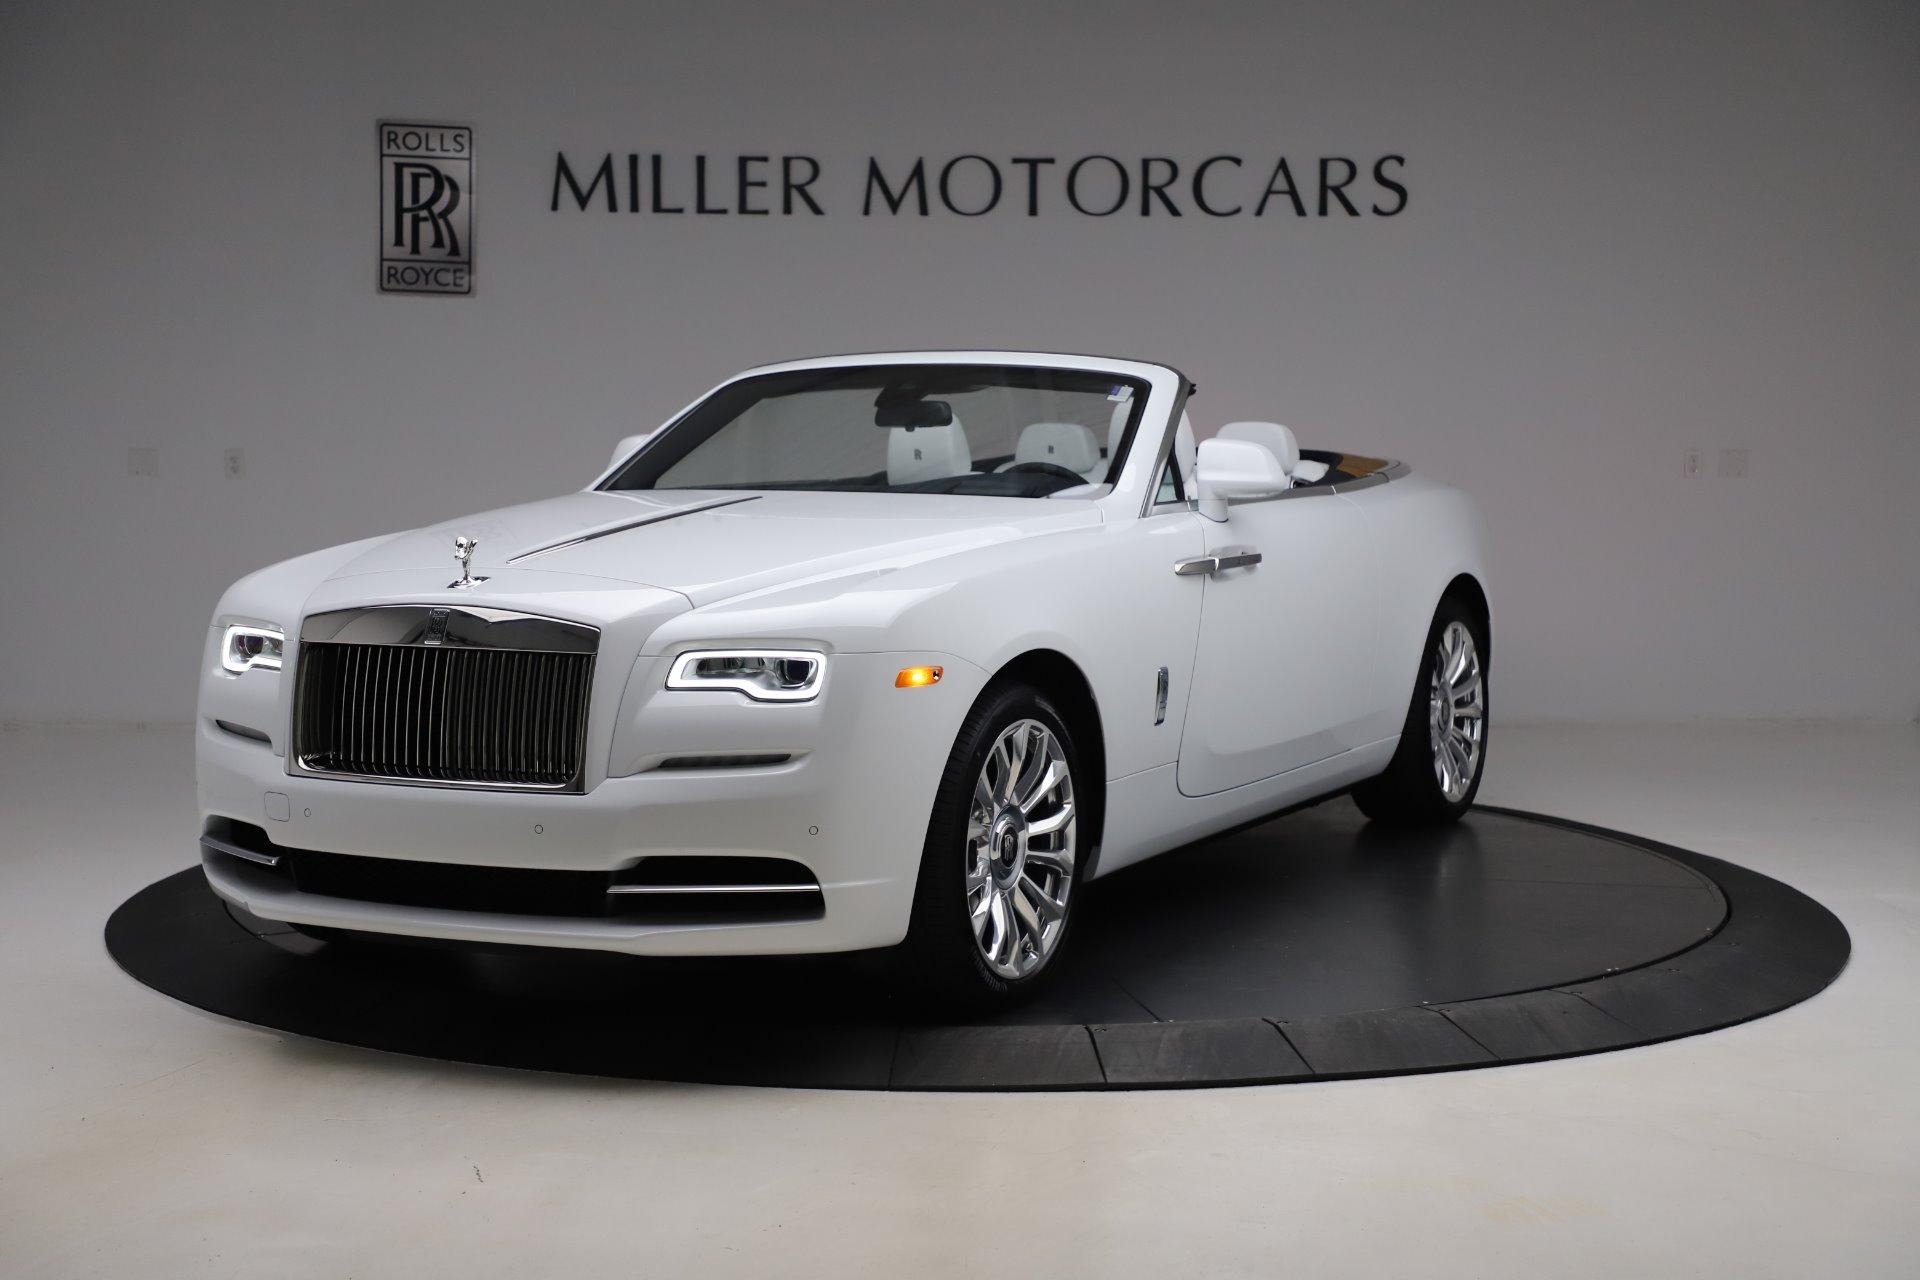 New 2020 Rolls-Royce Dawn for sale $401,175 at McLaren Greenwich in Greenwich CT 06830 1